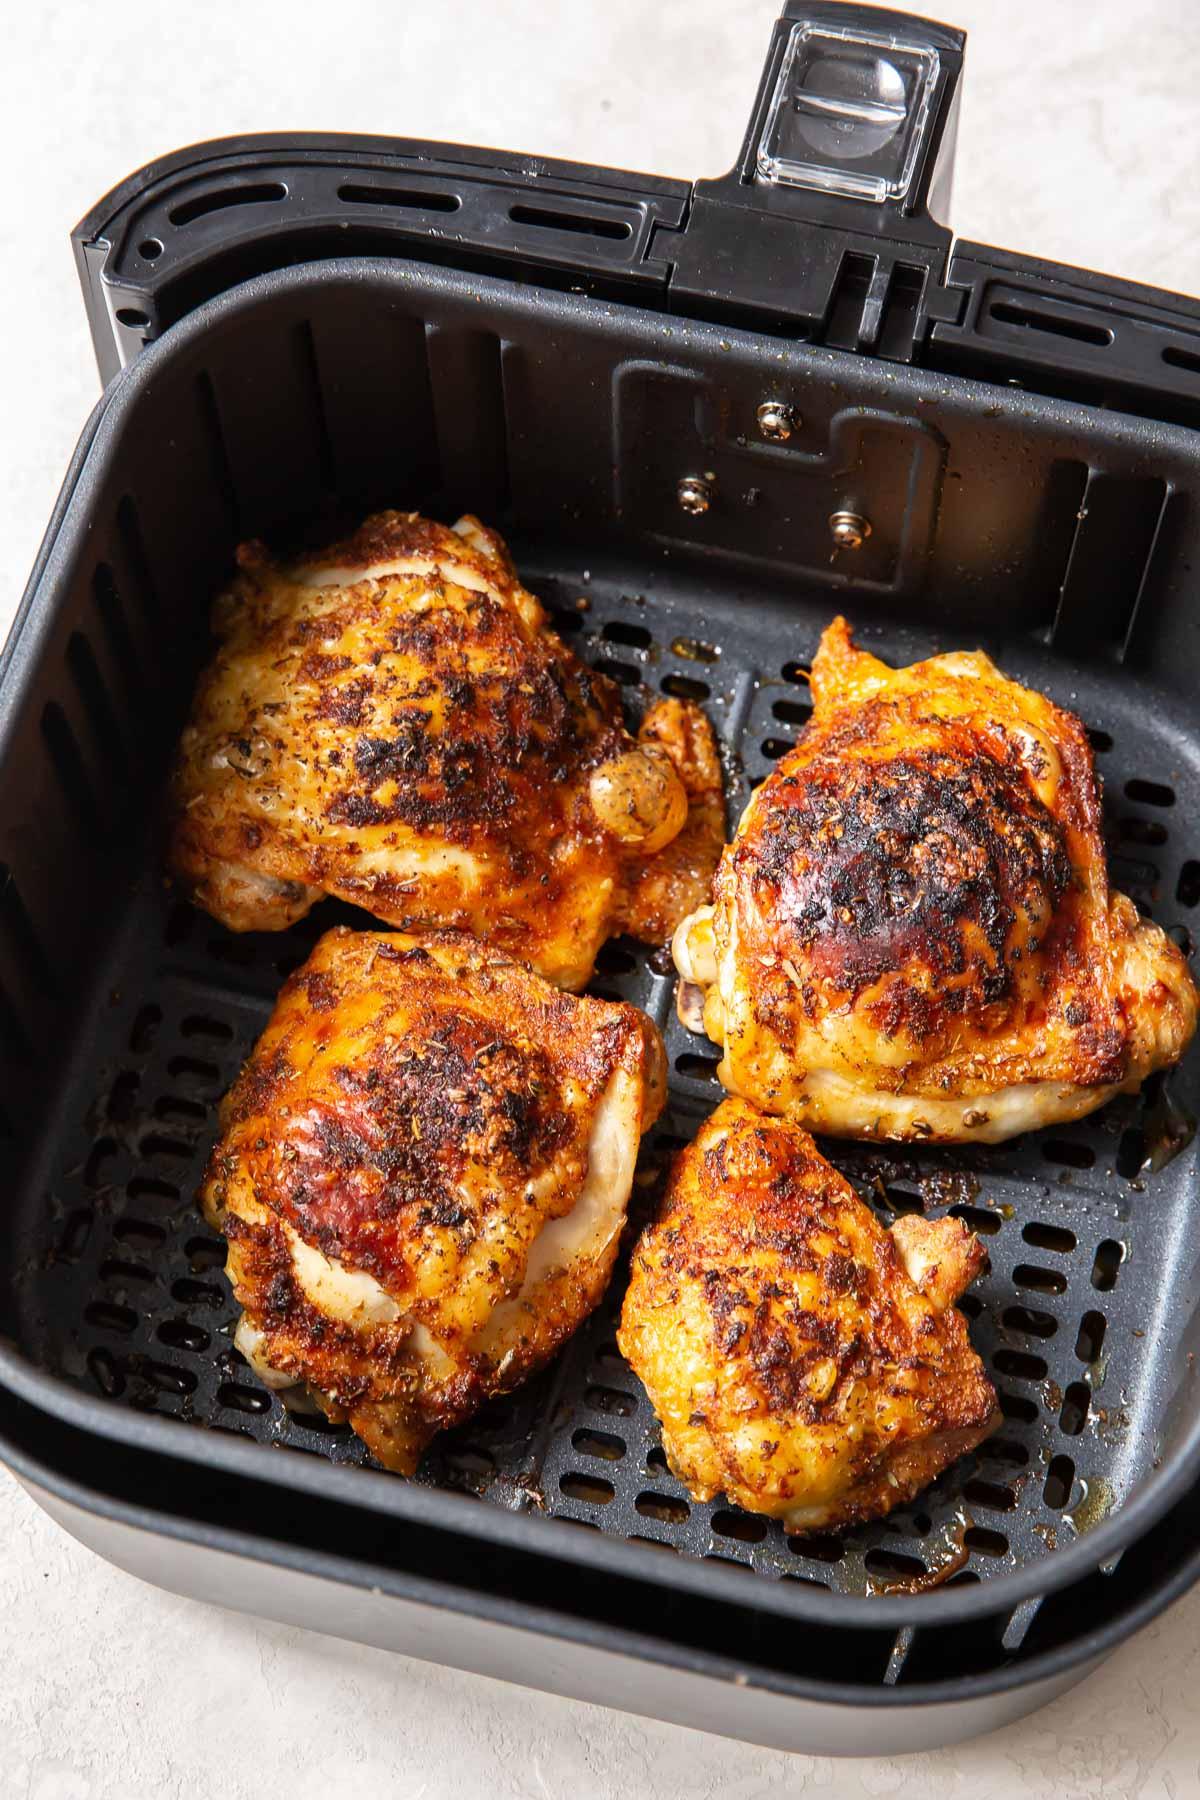 cooked crispy chicken thighs in air fryer basket